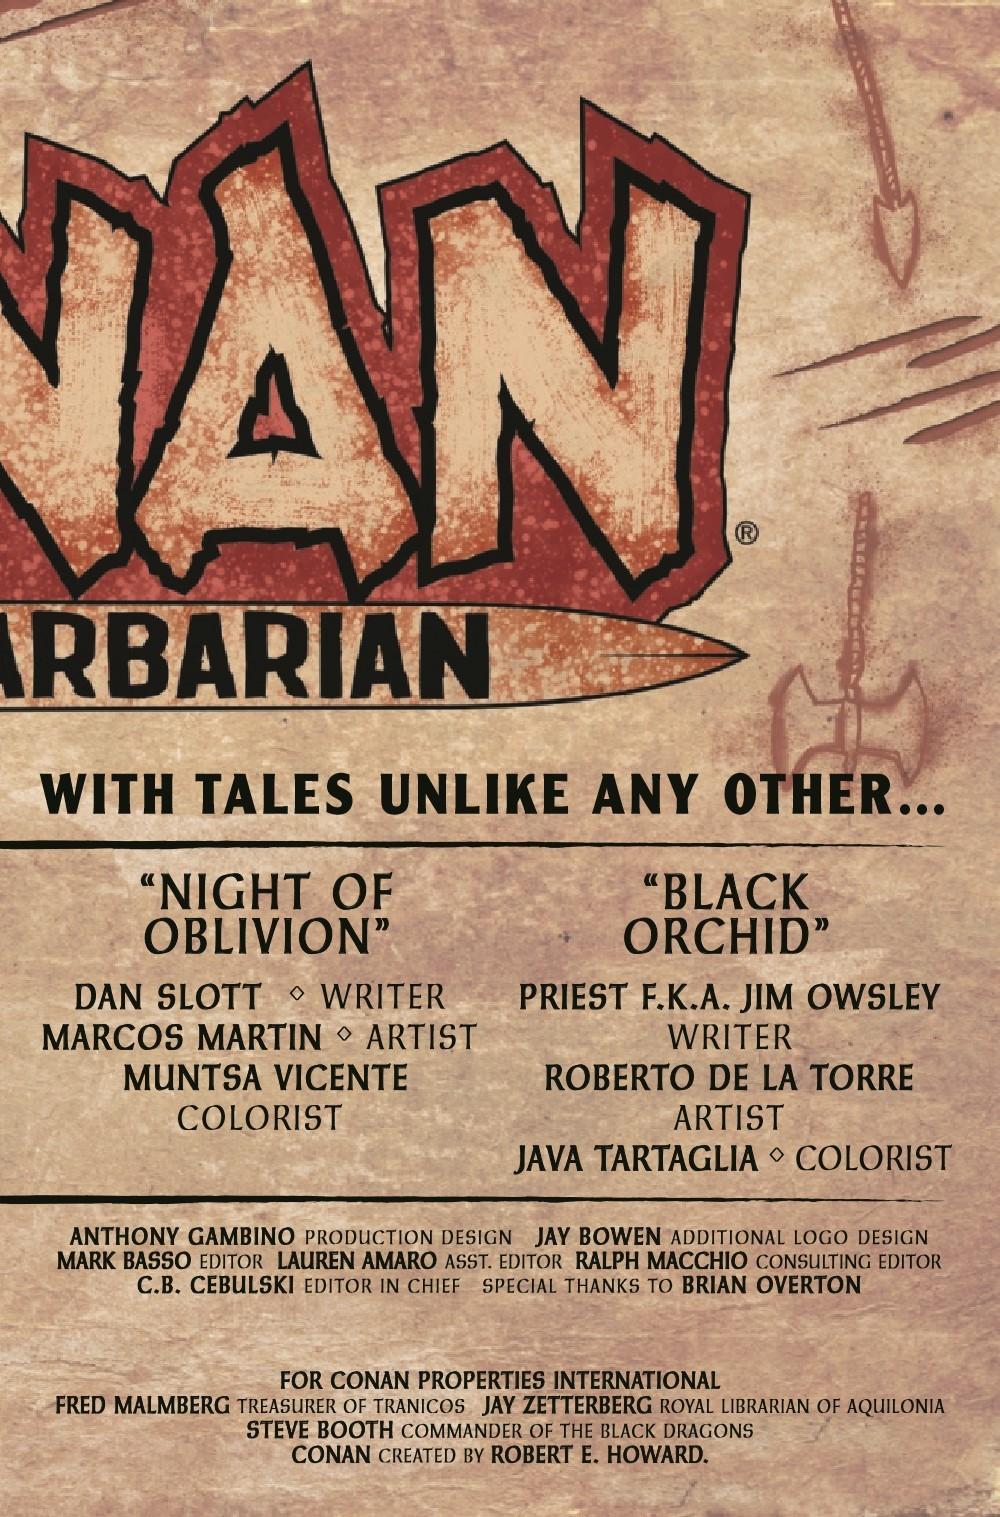 CONANBARB2019025_Preview-3 ComicList Previews: CONAN THE BARBARIAN #25